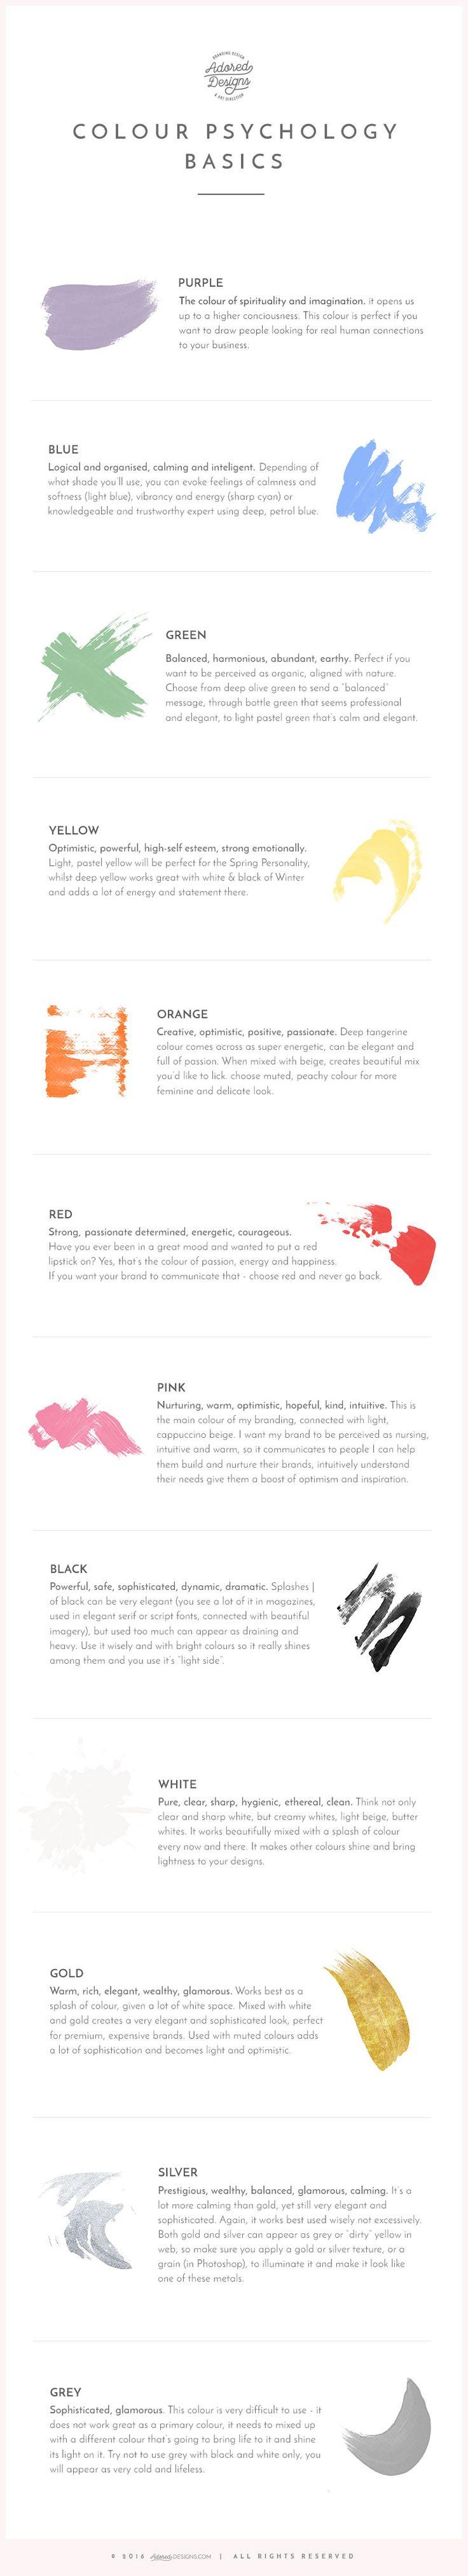 e36c8f89dc791861338dc8344313d566--free-infographic-color-psychology Psychology Infographic : Colour psychology – basics